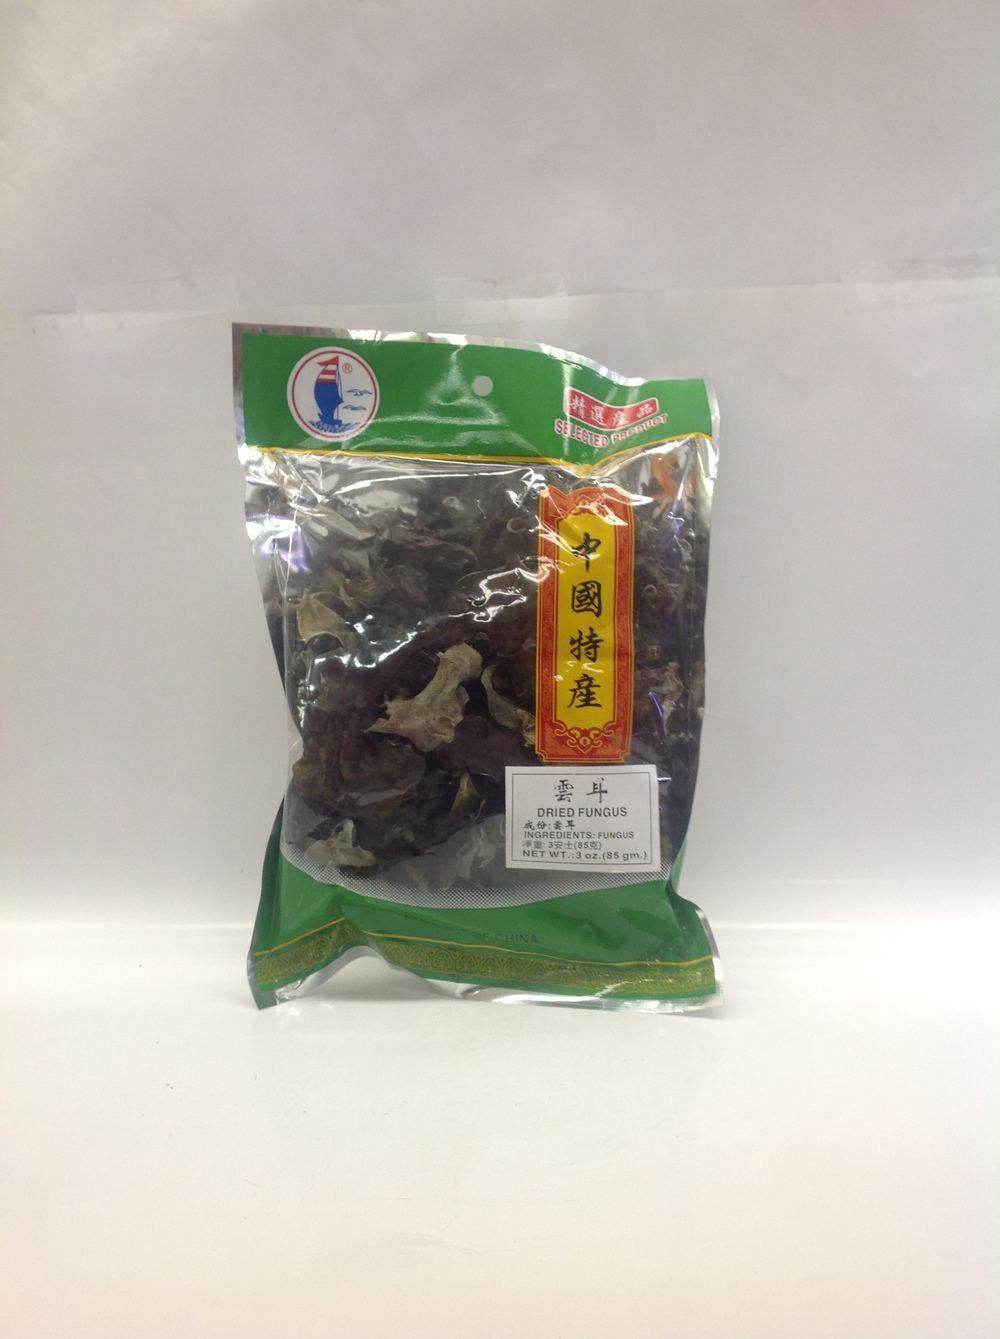 Dried Black Fungus   Hocean   DRV1211 100x2.5 oz (Small)  DRV1216 100x2.5 oz (Strip)  DRV1219 100x2.5 oz (Whole)